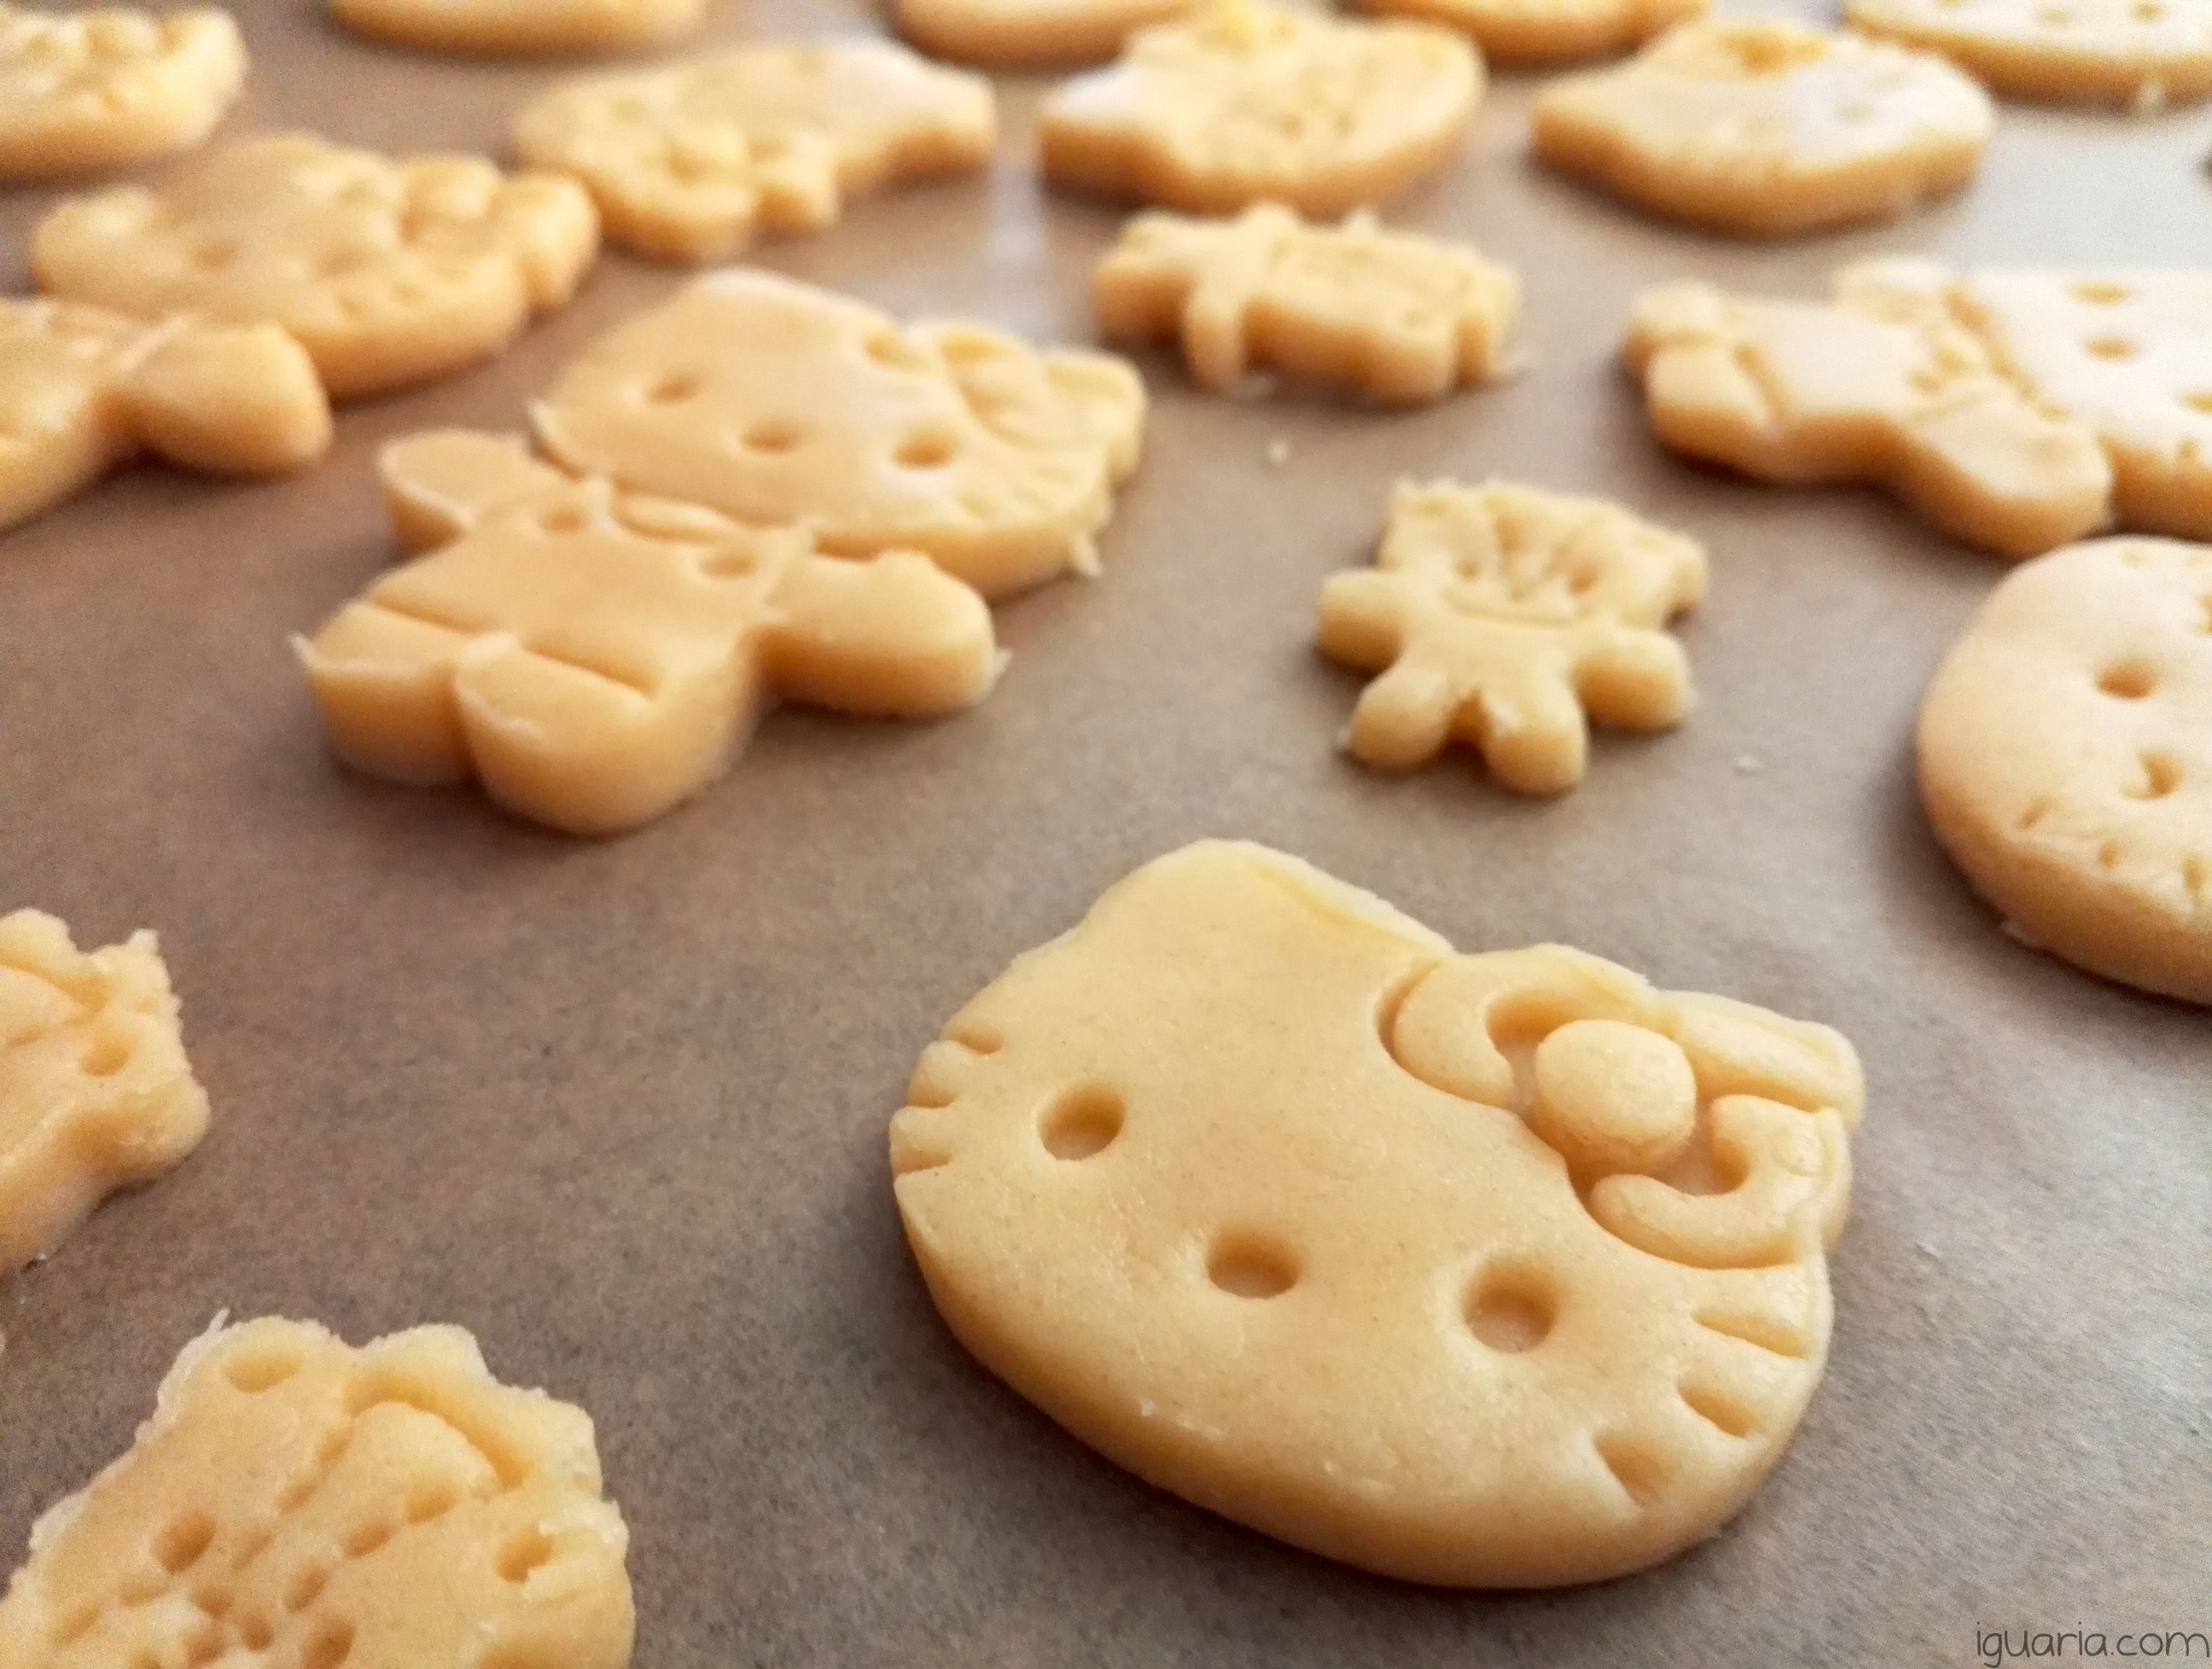 iguaria-biscoitos-hello-kitty-moldados